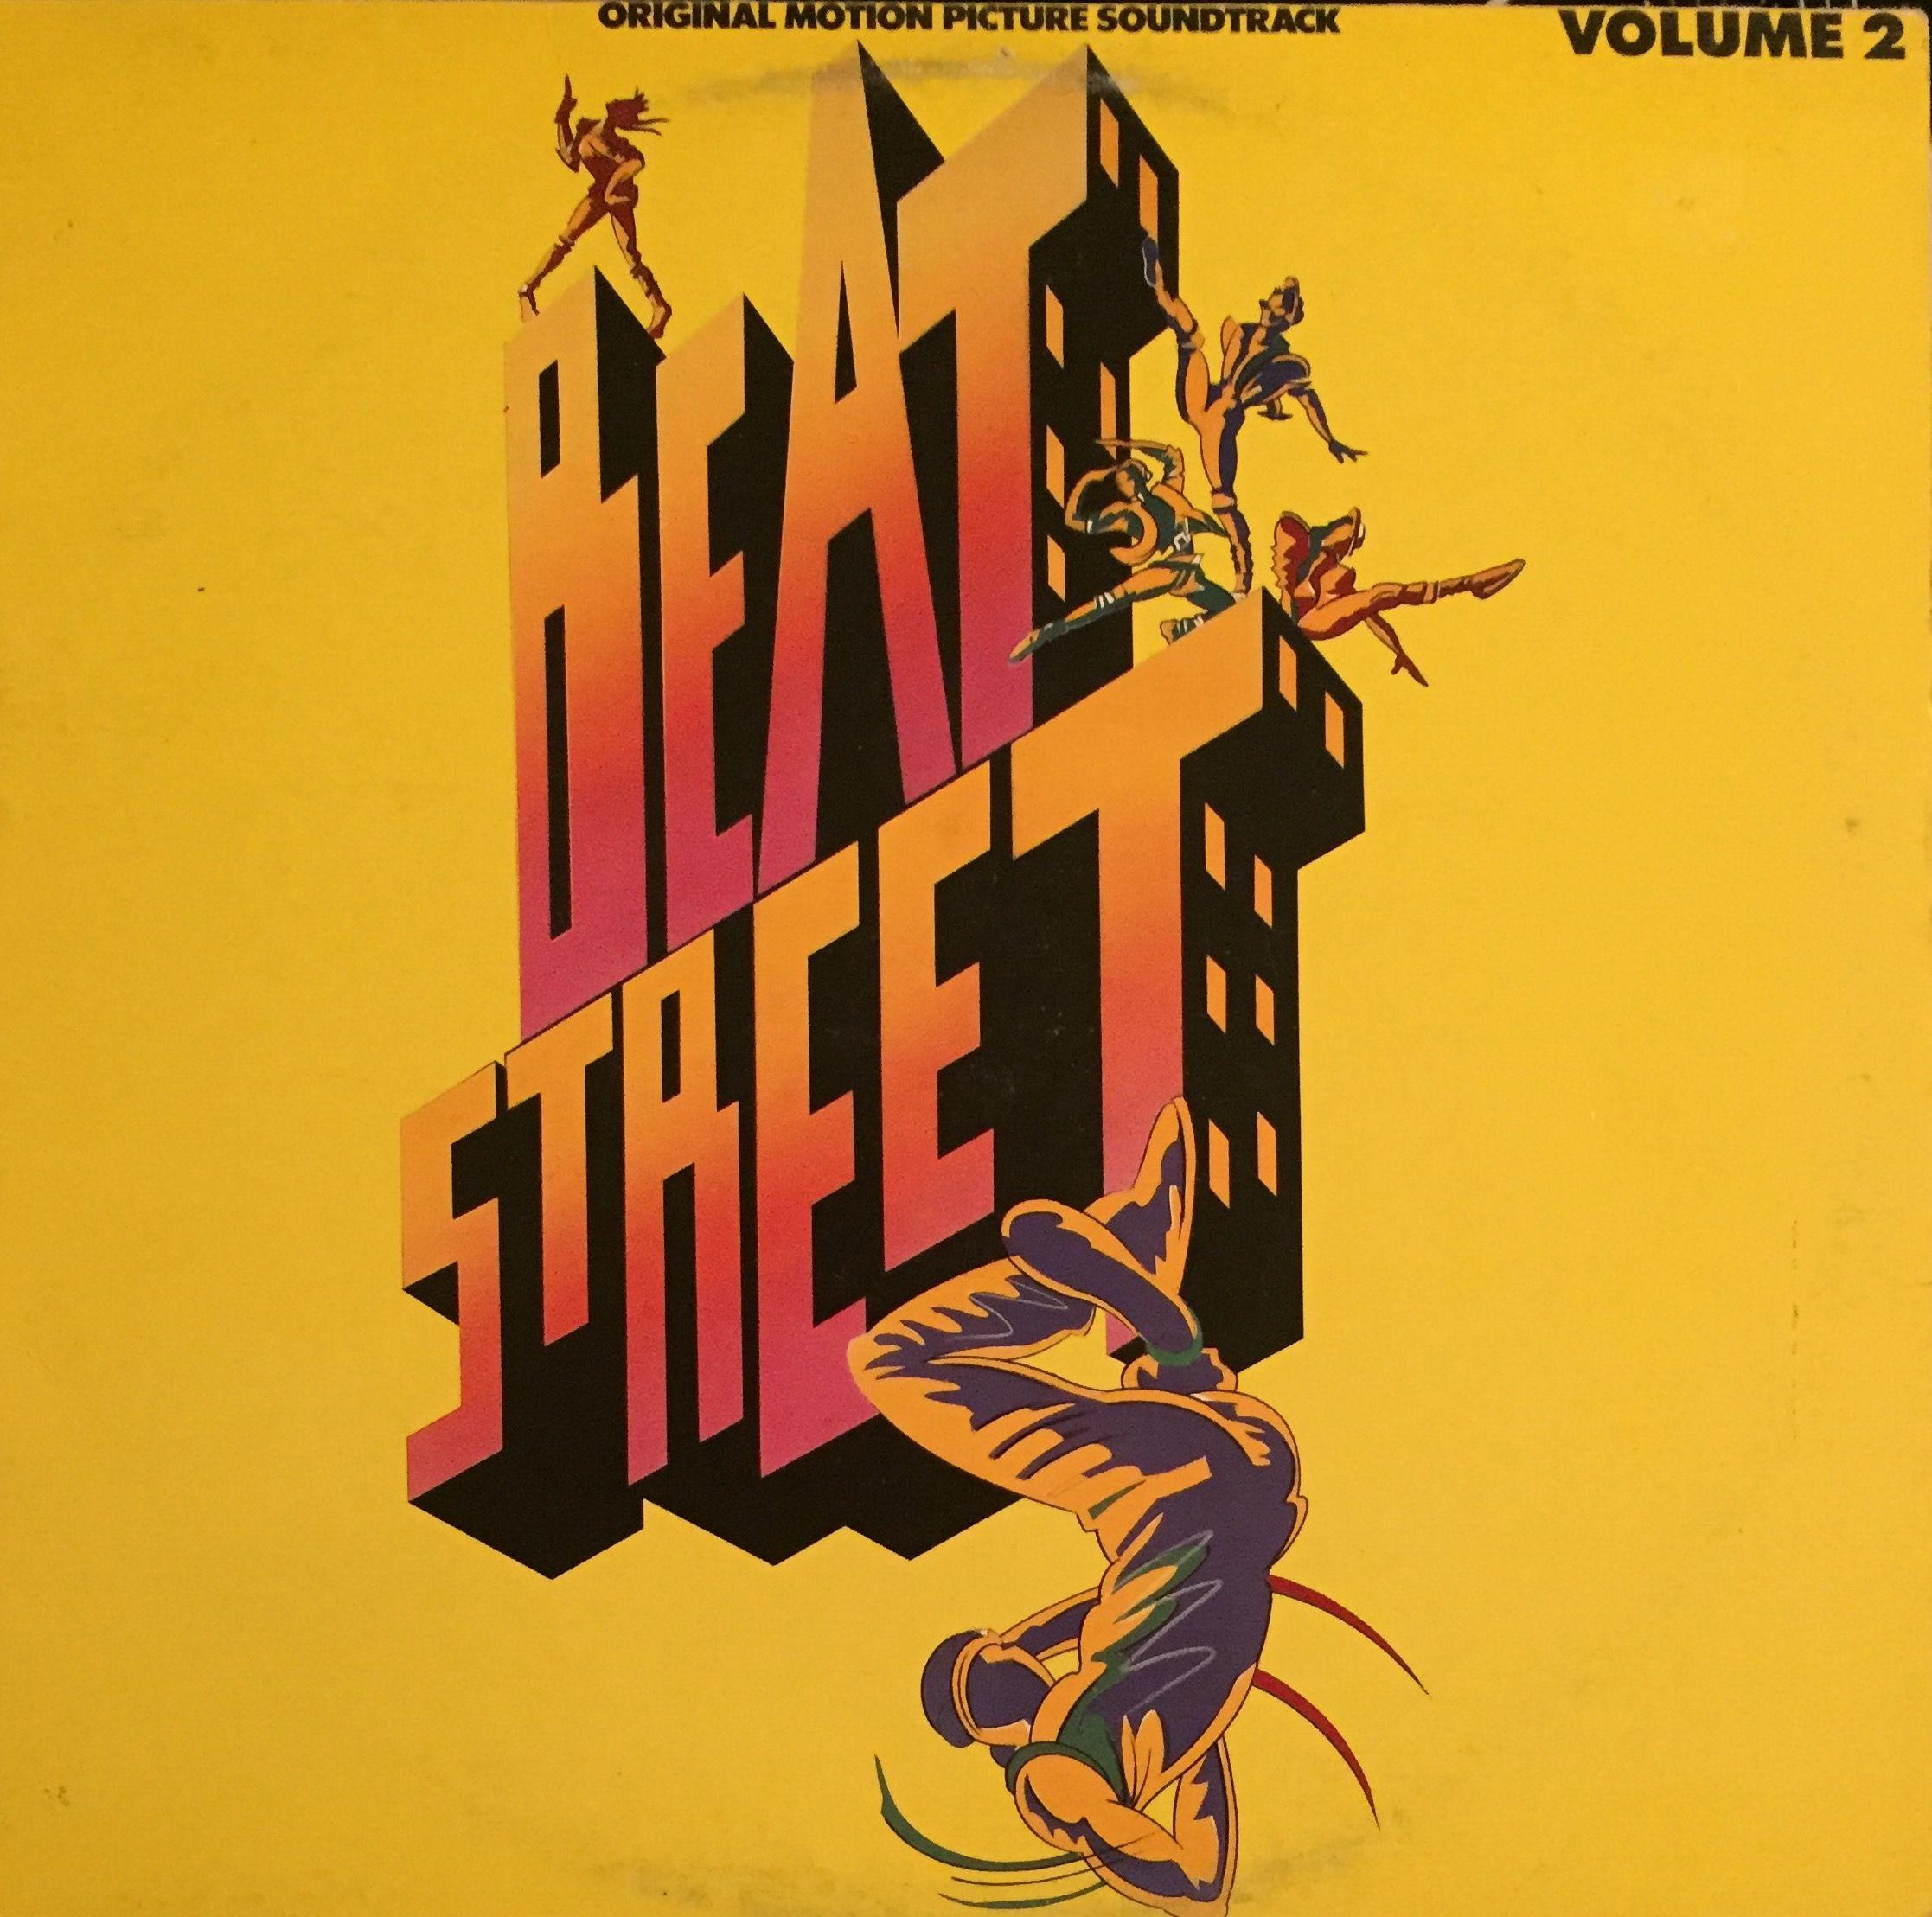 'Beat Street' soundtrack Volume 2, Atlantic Records 1984 hip-hop #vinyl #rap #records. Break #beats. #ArthurBaker. #Breakdance #Graffiti #DJ #oldschool #hiphop #80s #movies